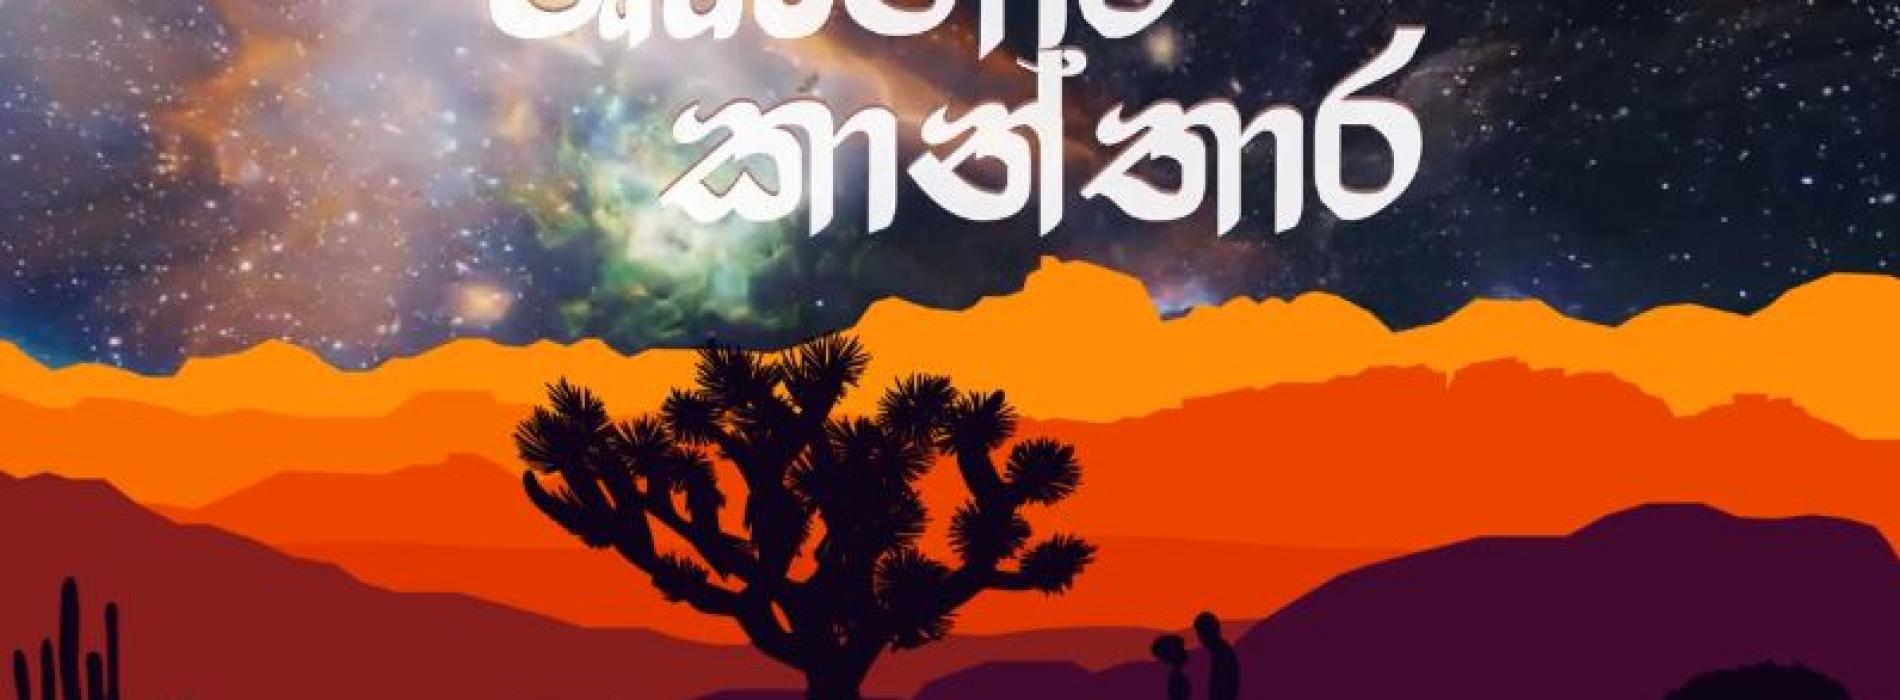 New Music : Shrungara Kanthara   ශෘංගාර කාන්තාර   Heshan Manatunga